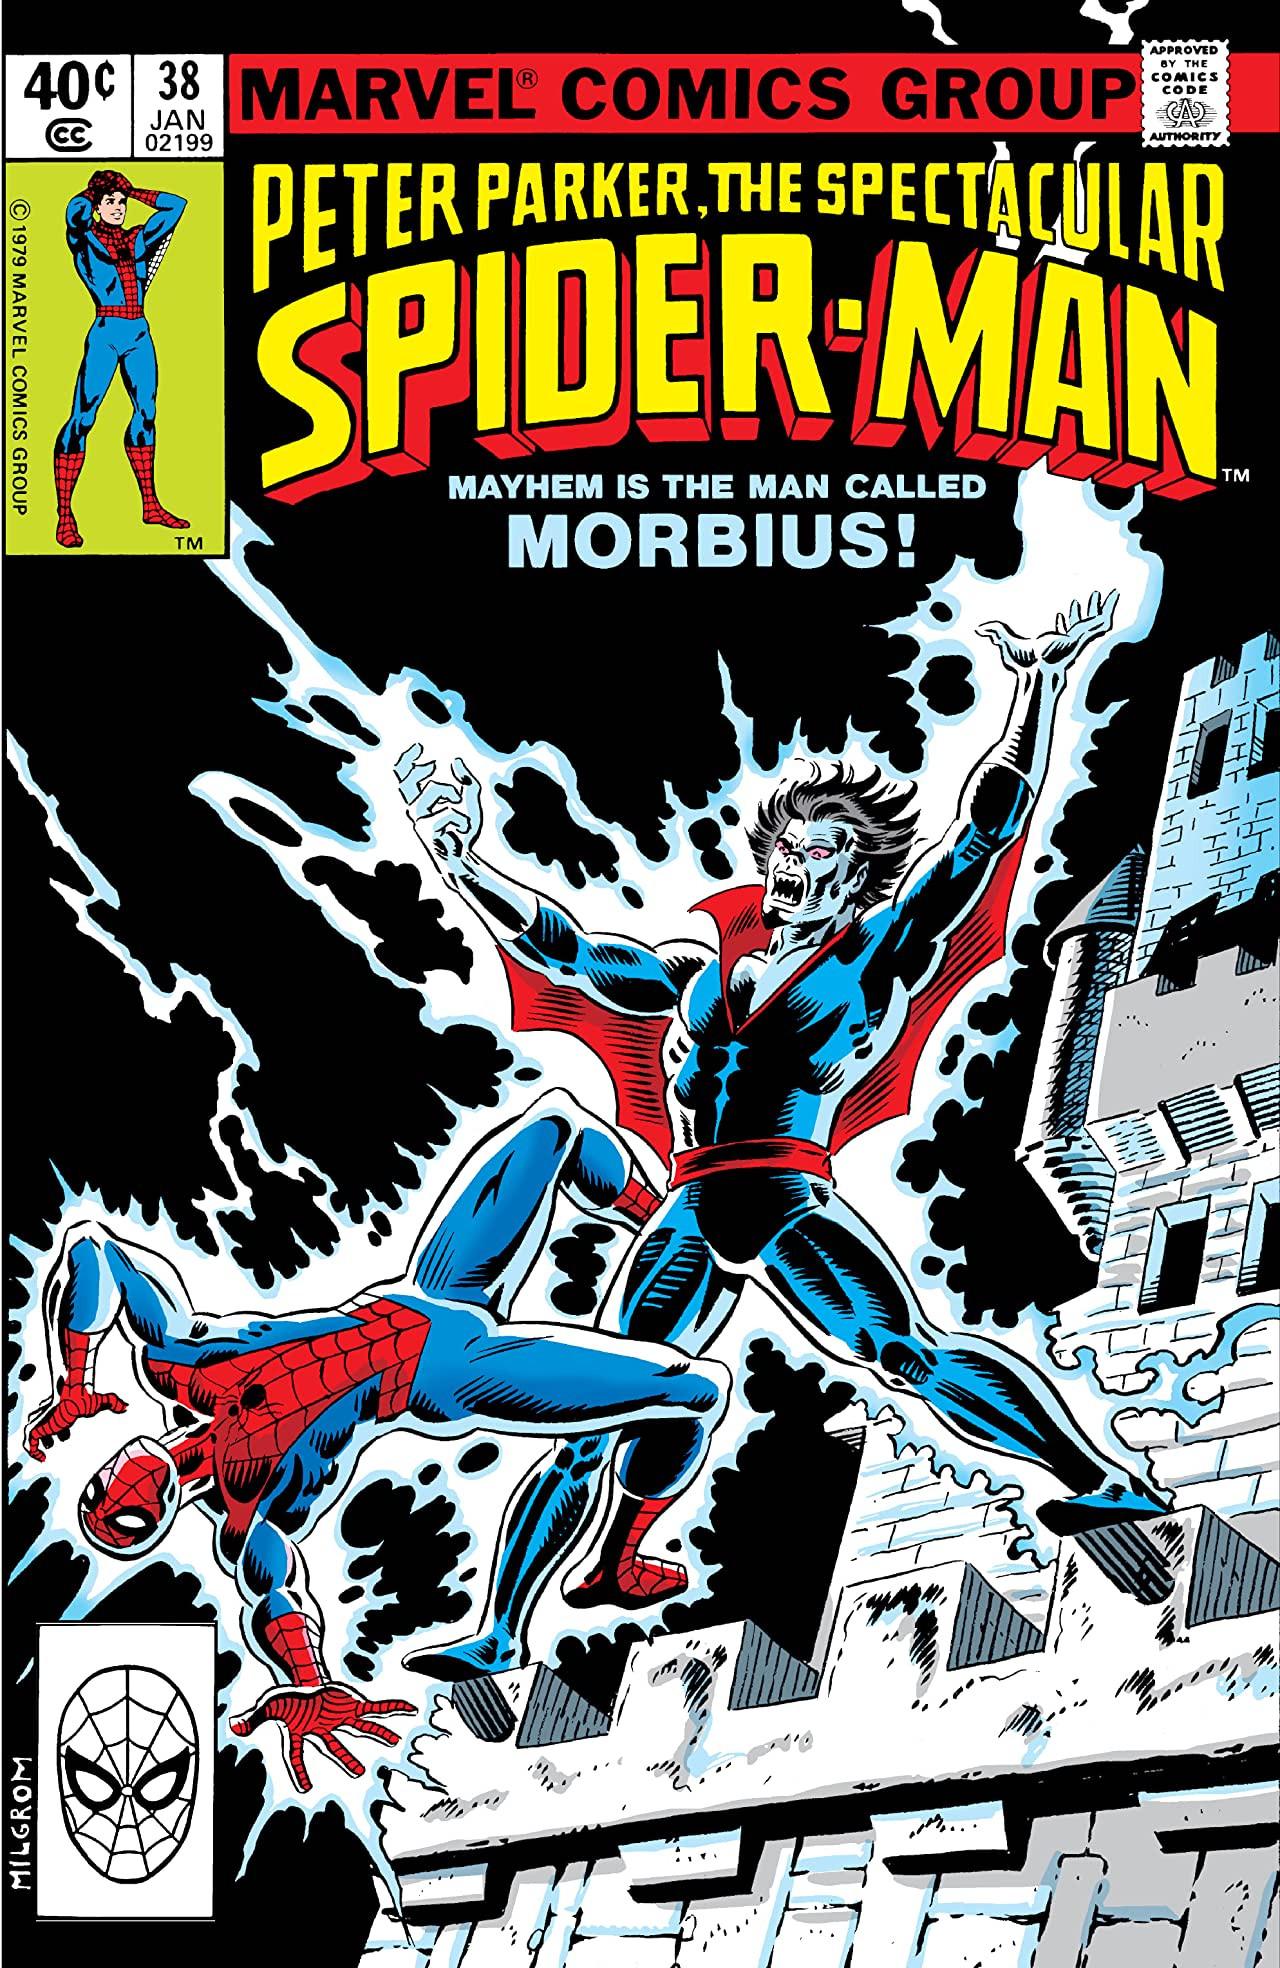 Peter Parker, The Spectacular Spider-Man Vol 1 38